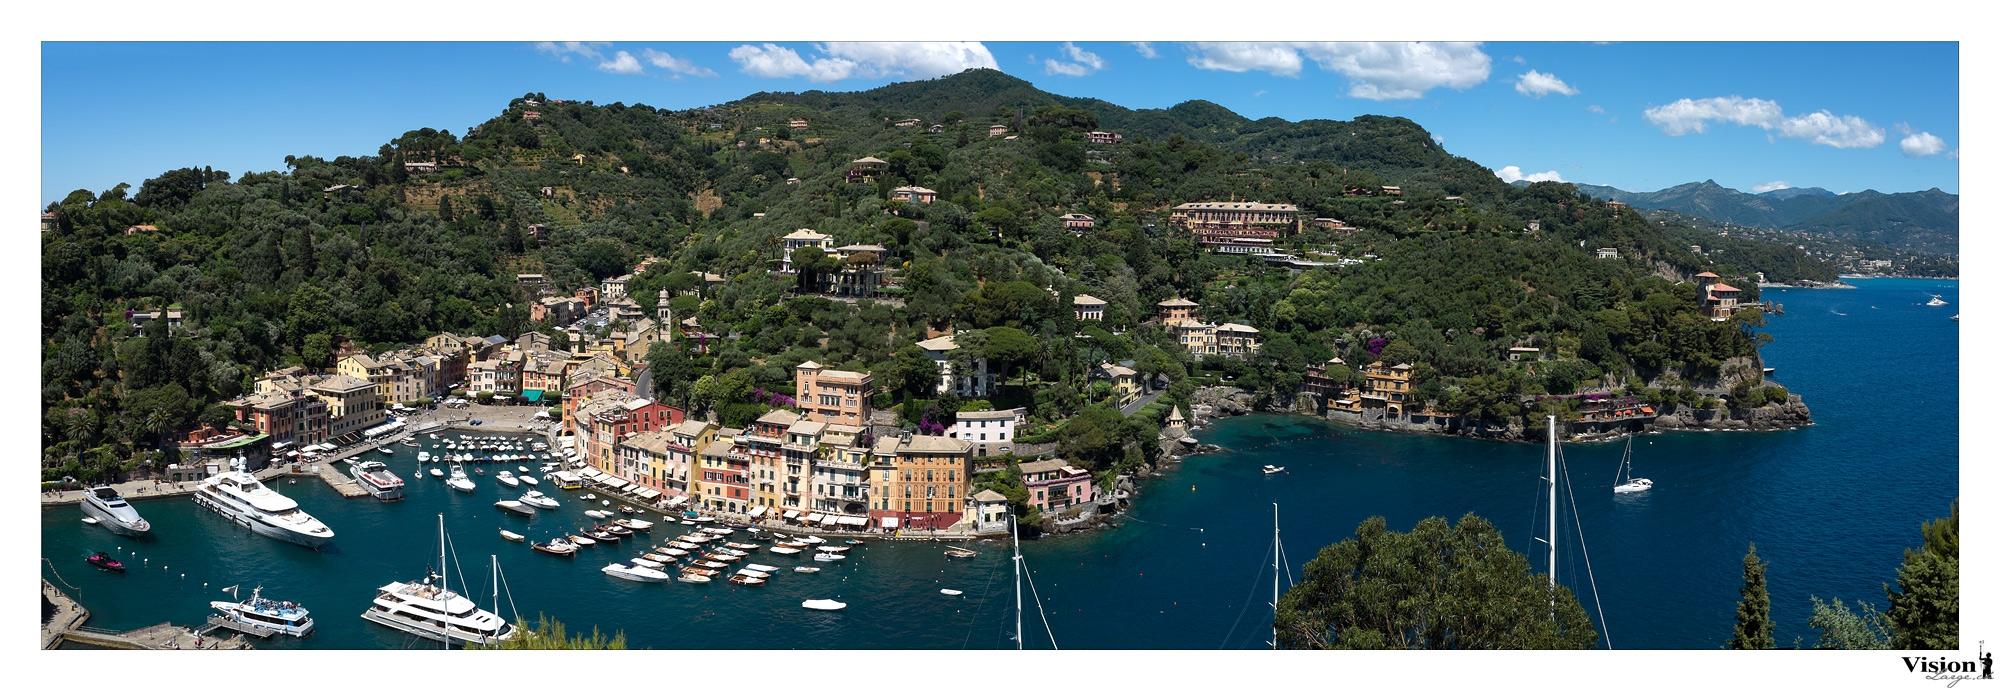 Portofino, Ligurie, Italie